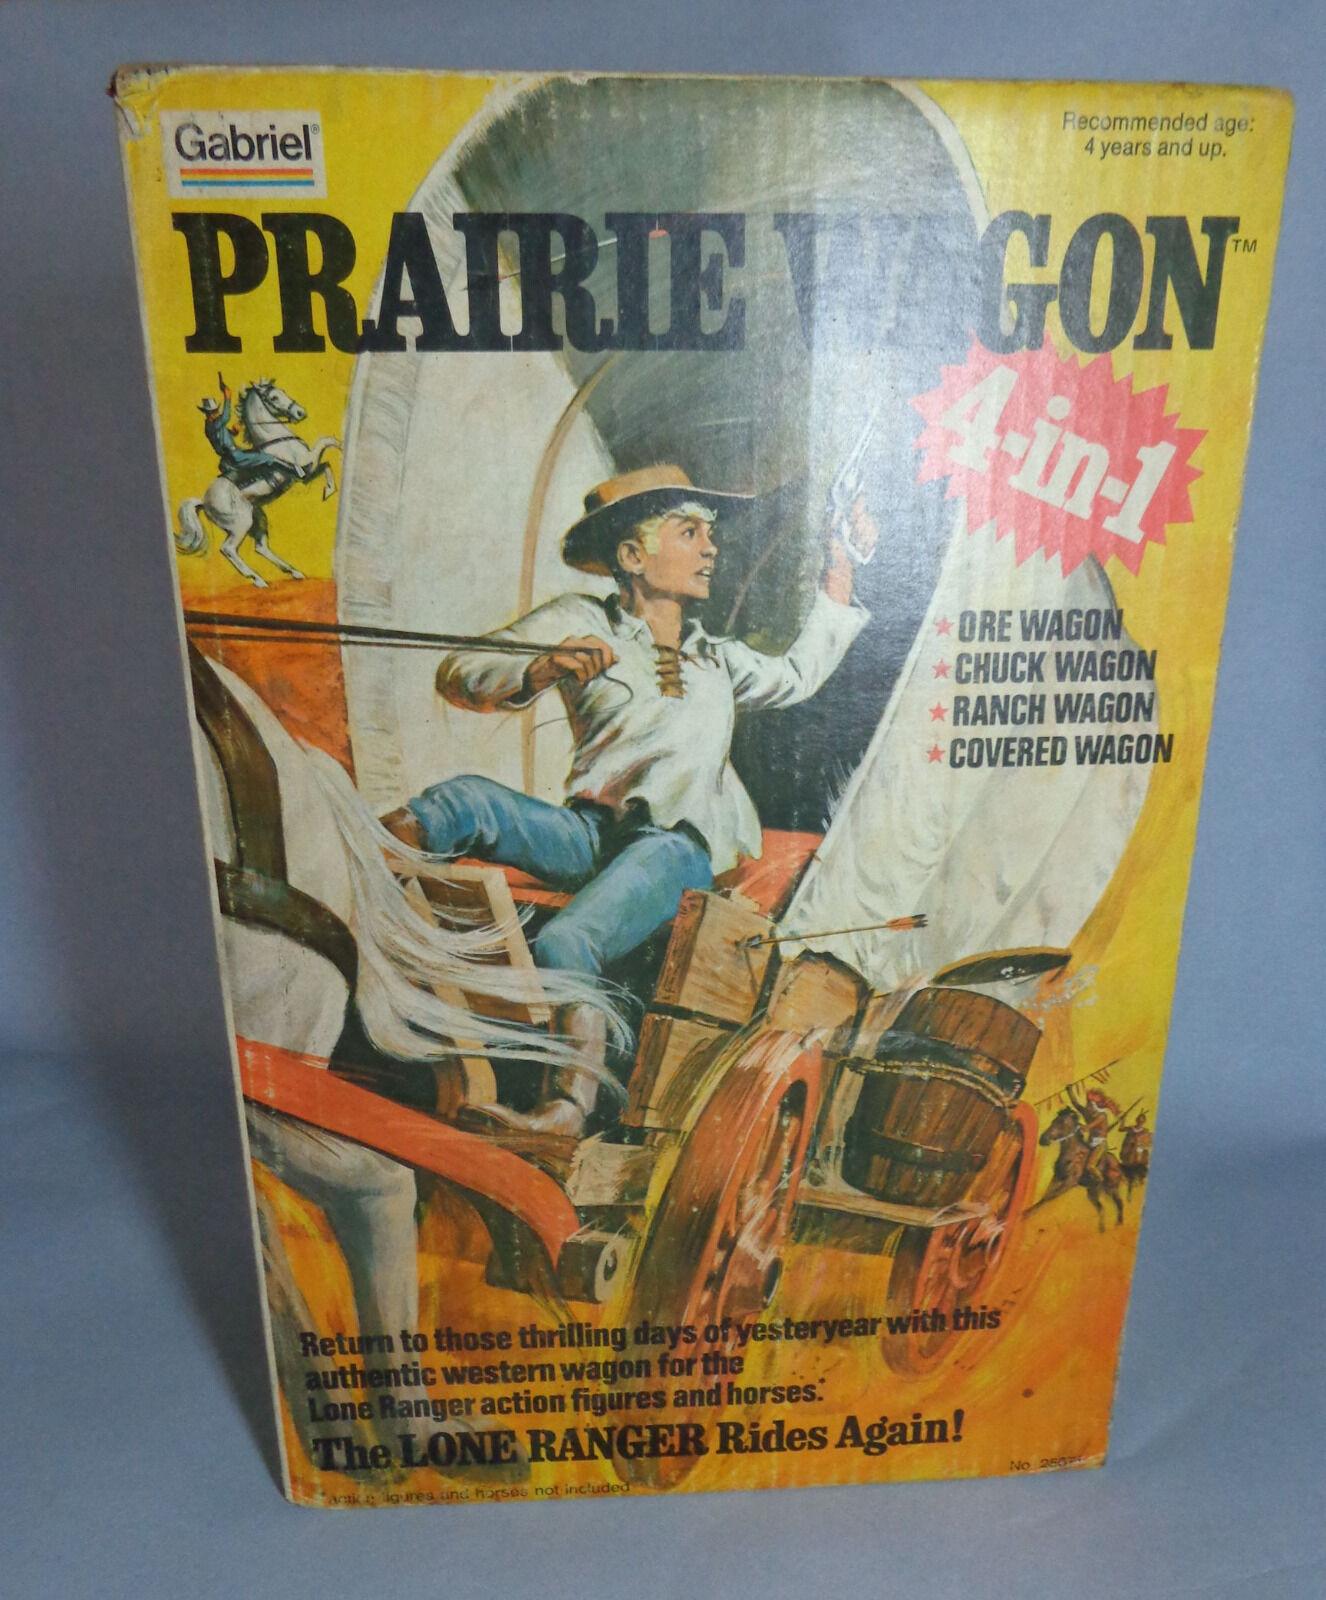 1  6 Lone Ranger Prairie Wagon 4 i 1 -årgång Gabriel leksak - SEALD NY